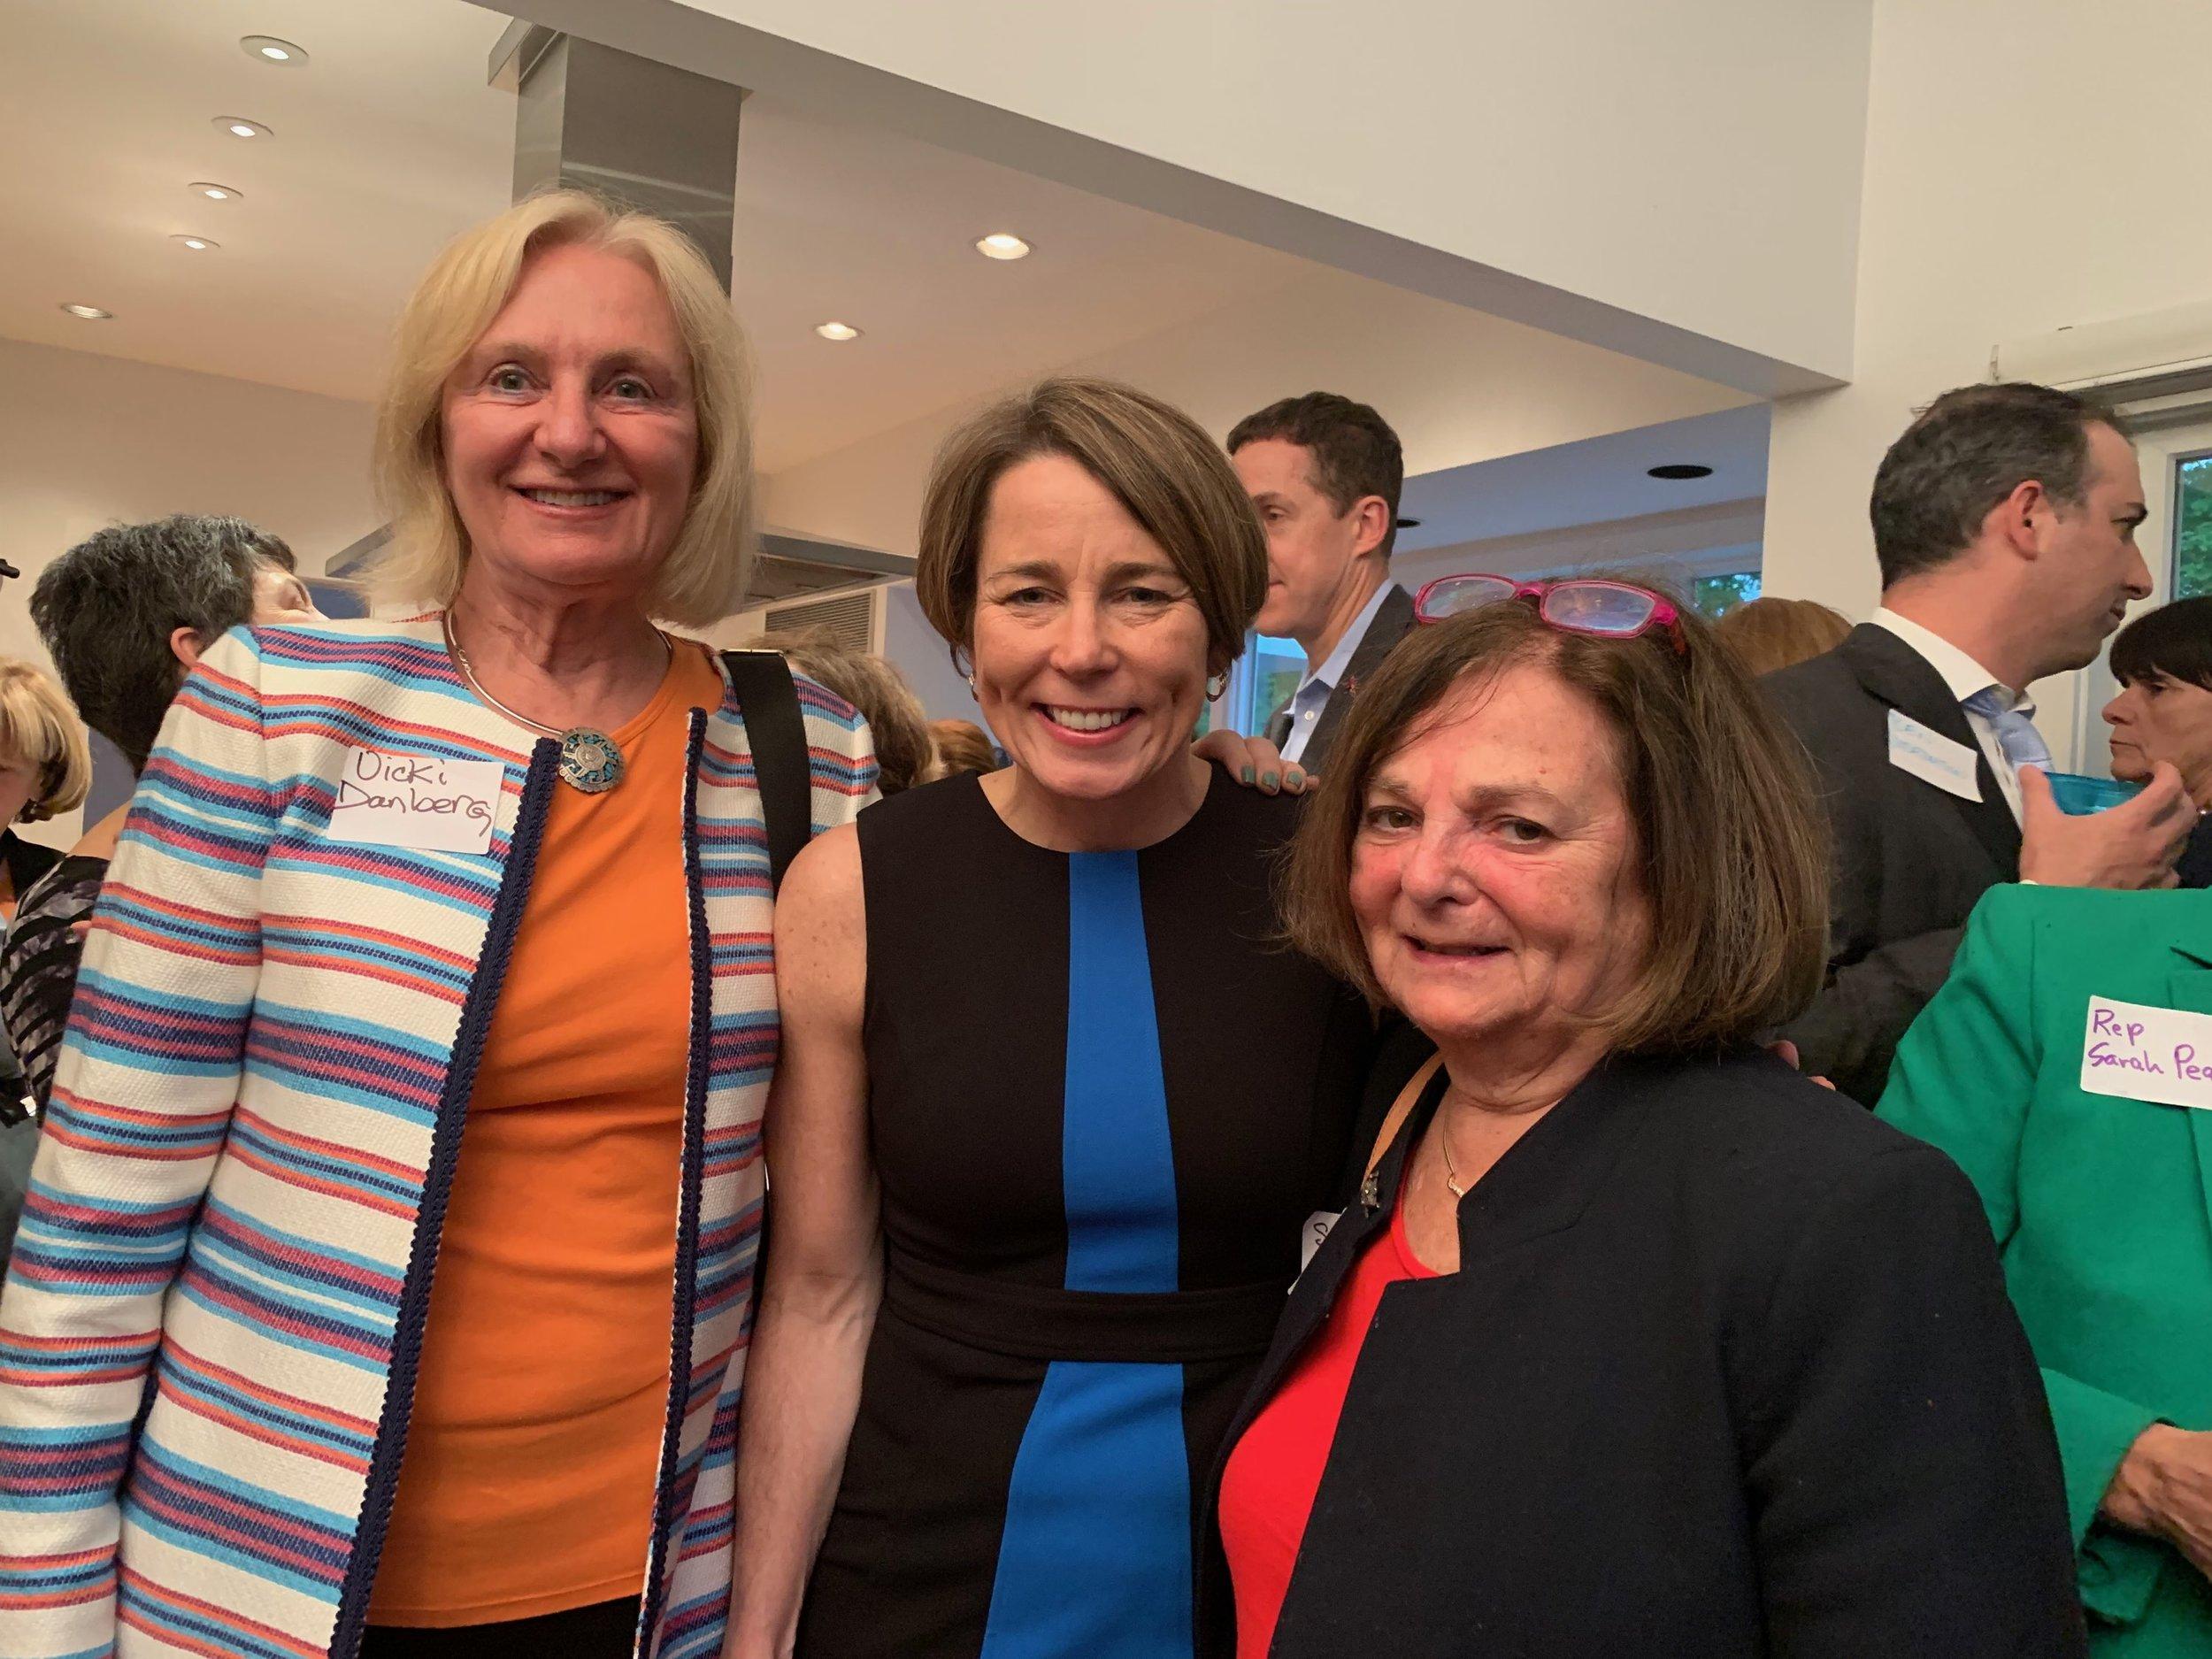 Vicki, Maura Healey and Councilor Susan Albright